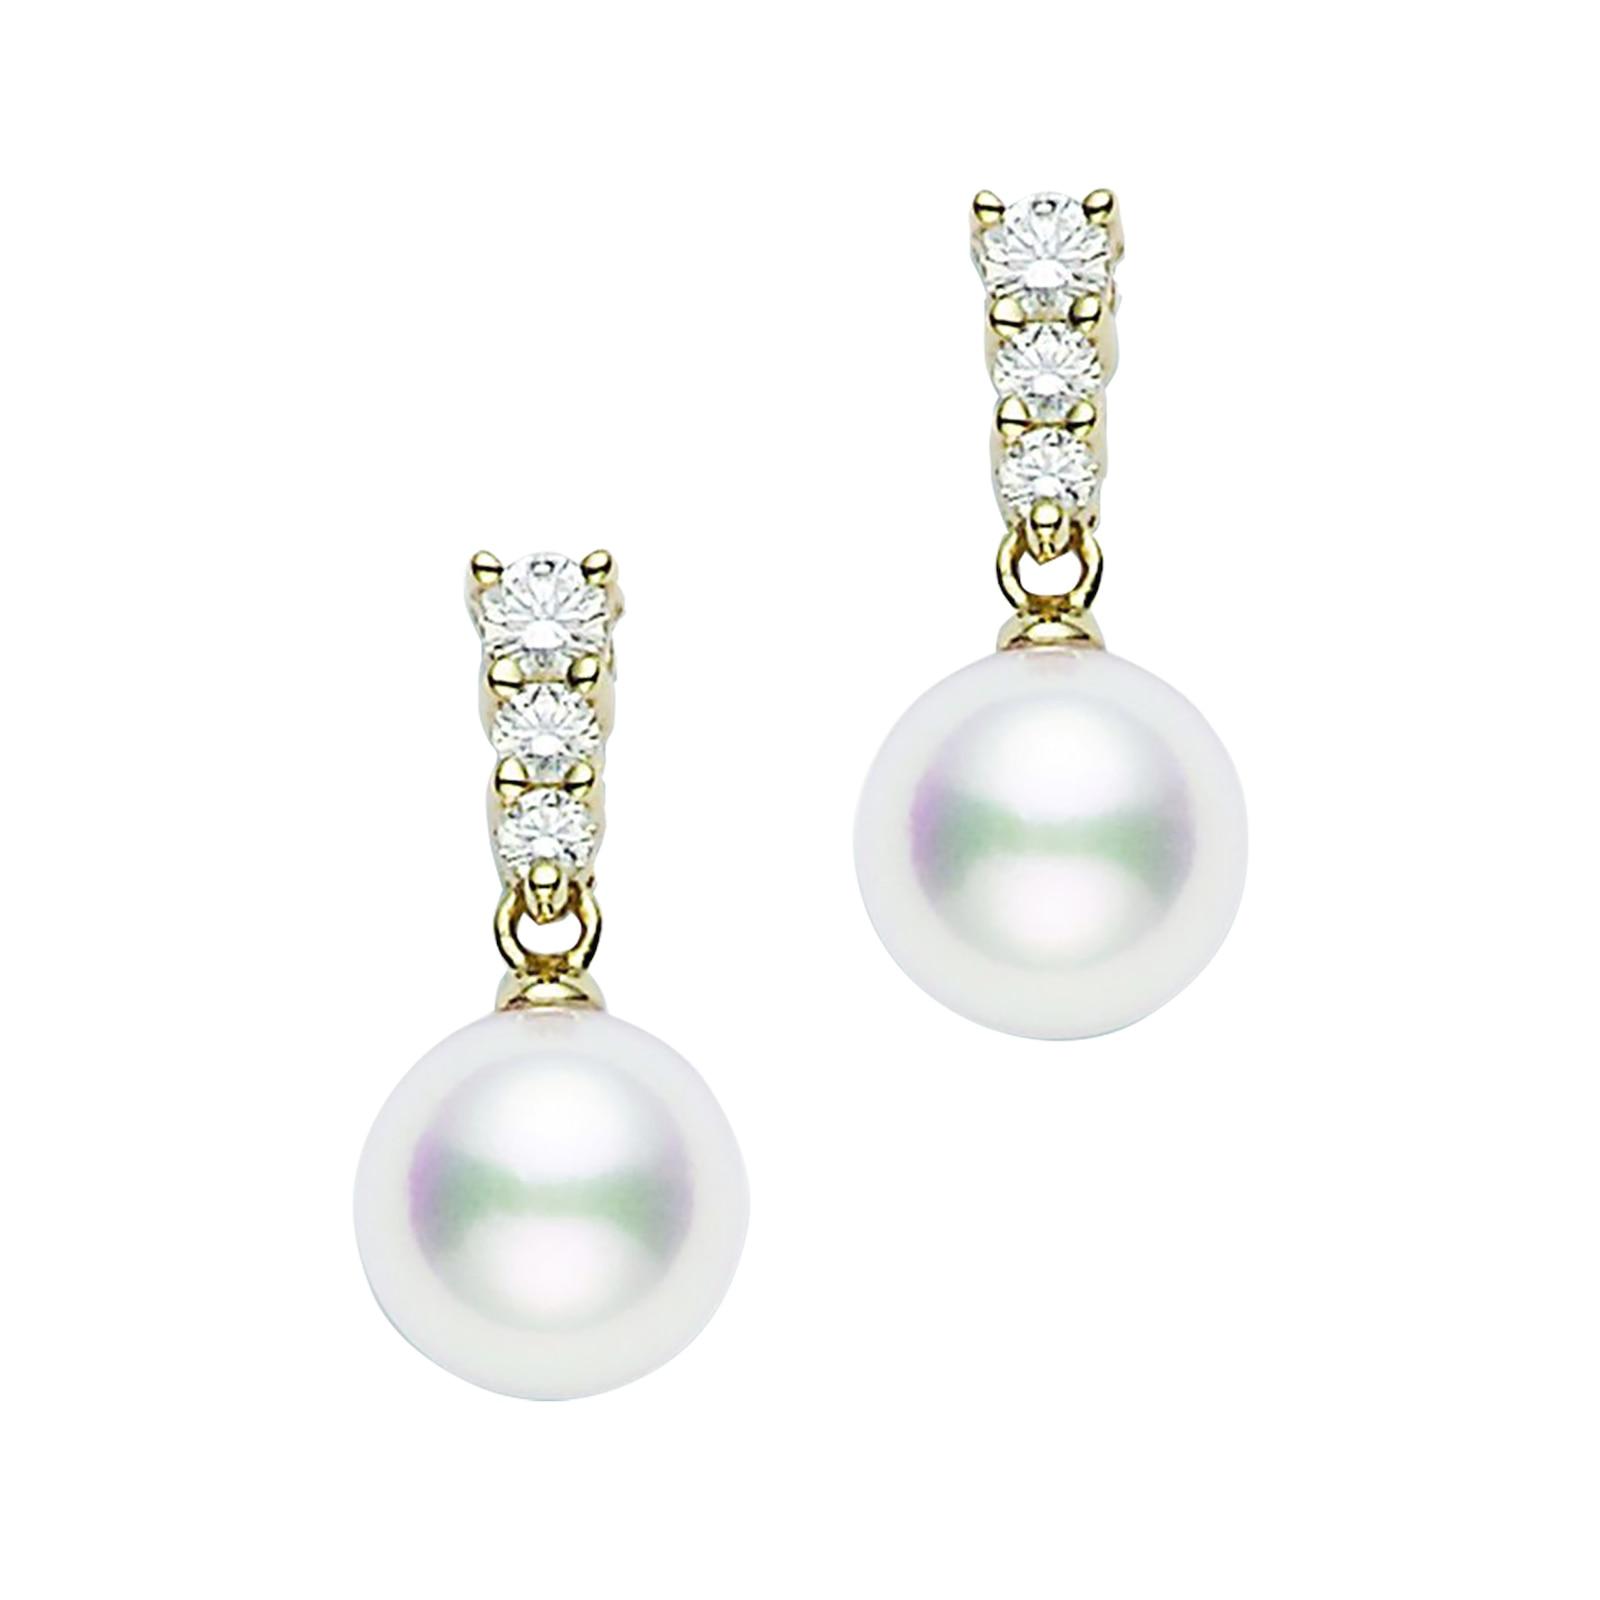 Mikimoto 8mm Akoya Cultured Pearl and Diamond Drop Earrings